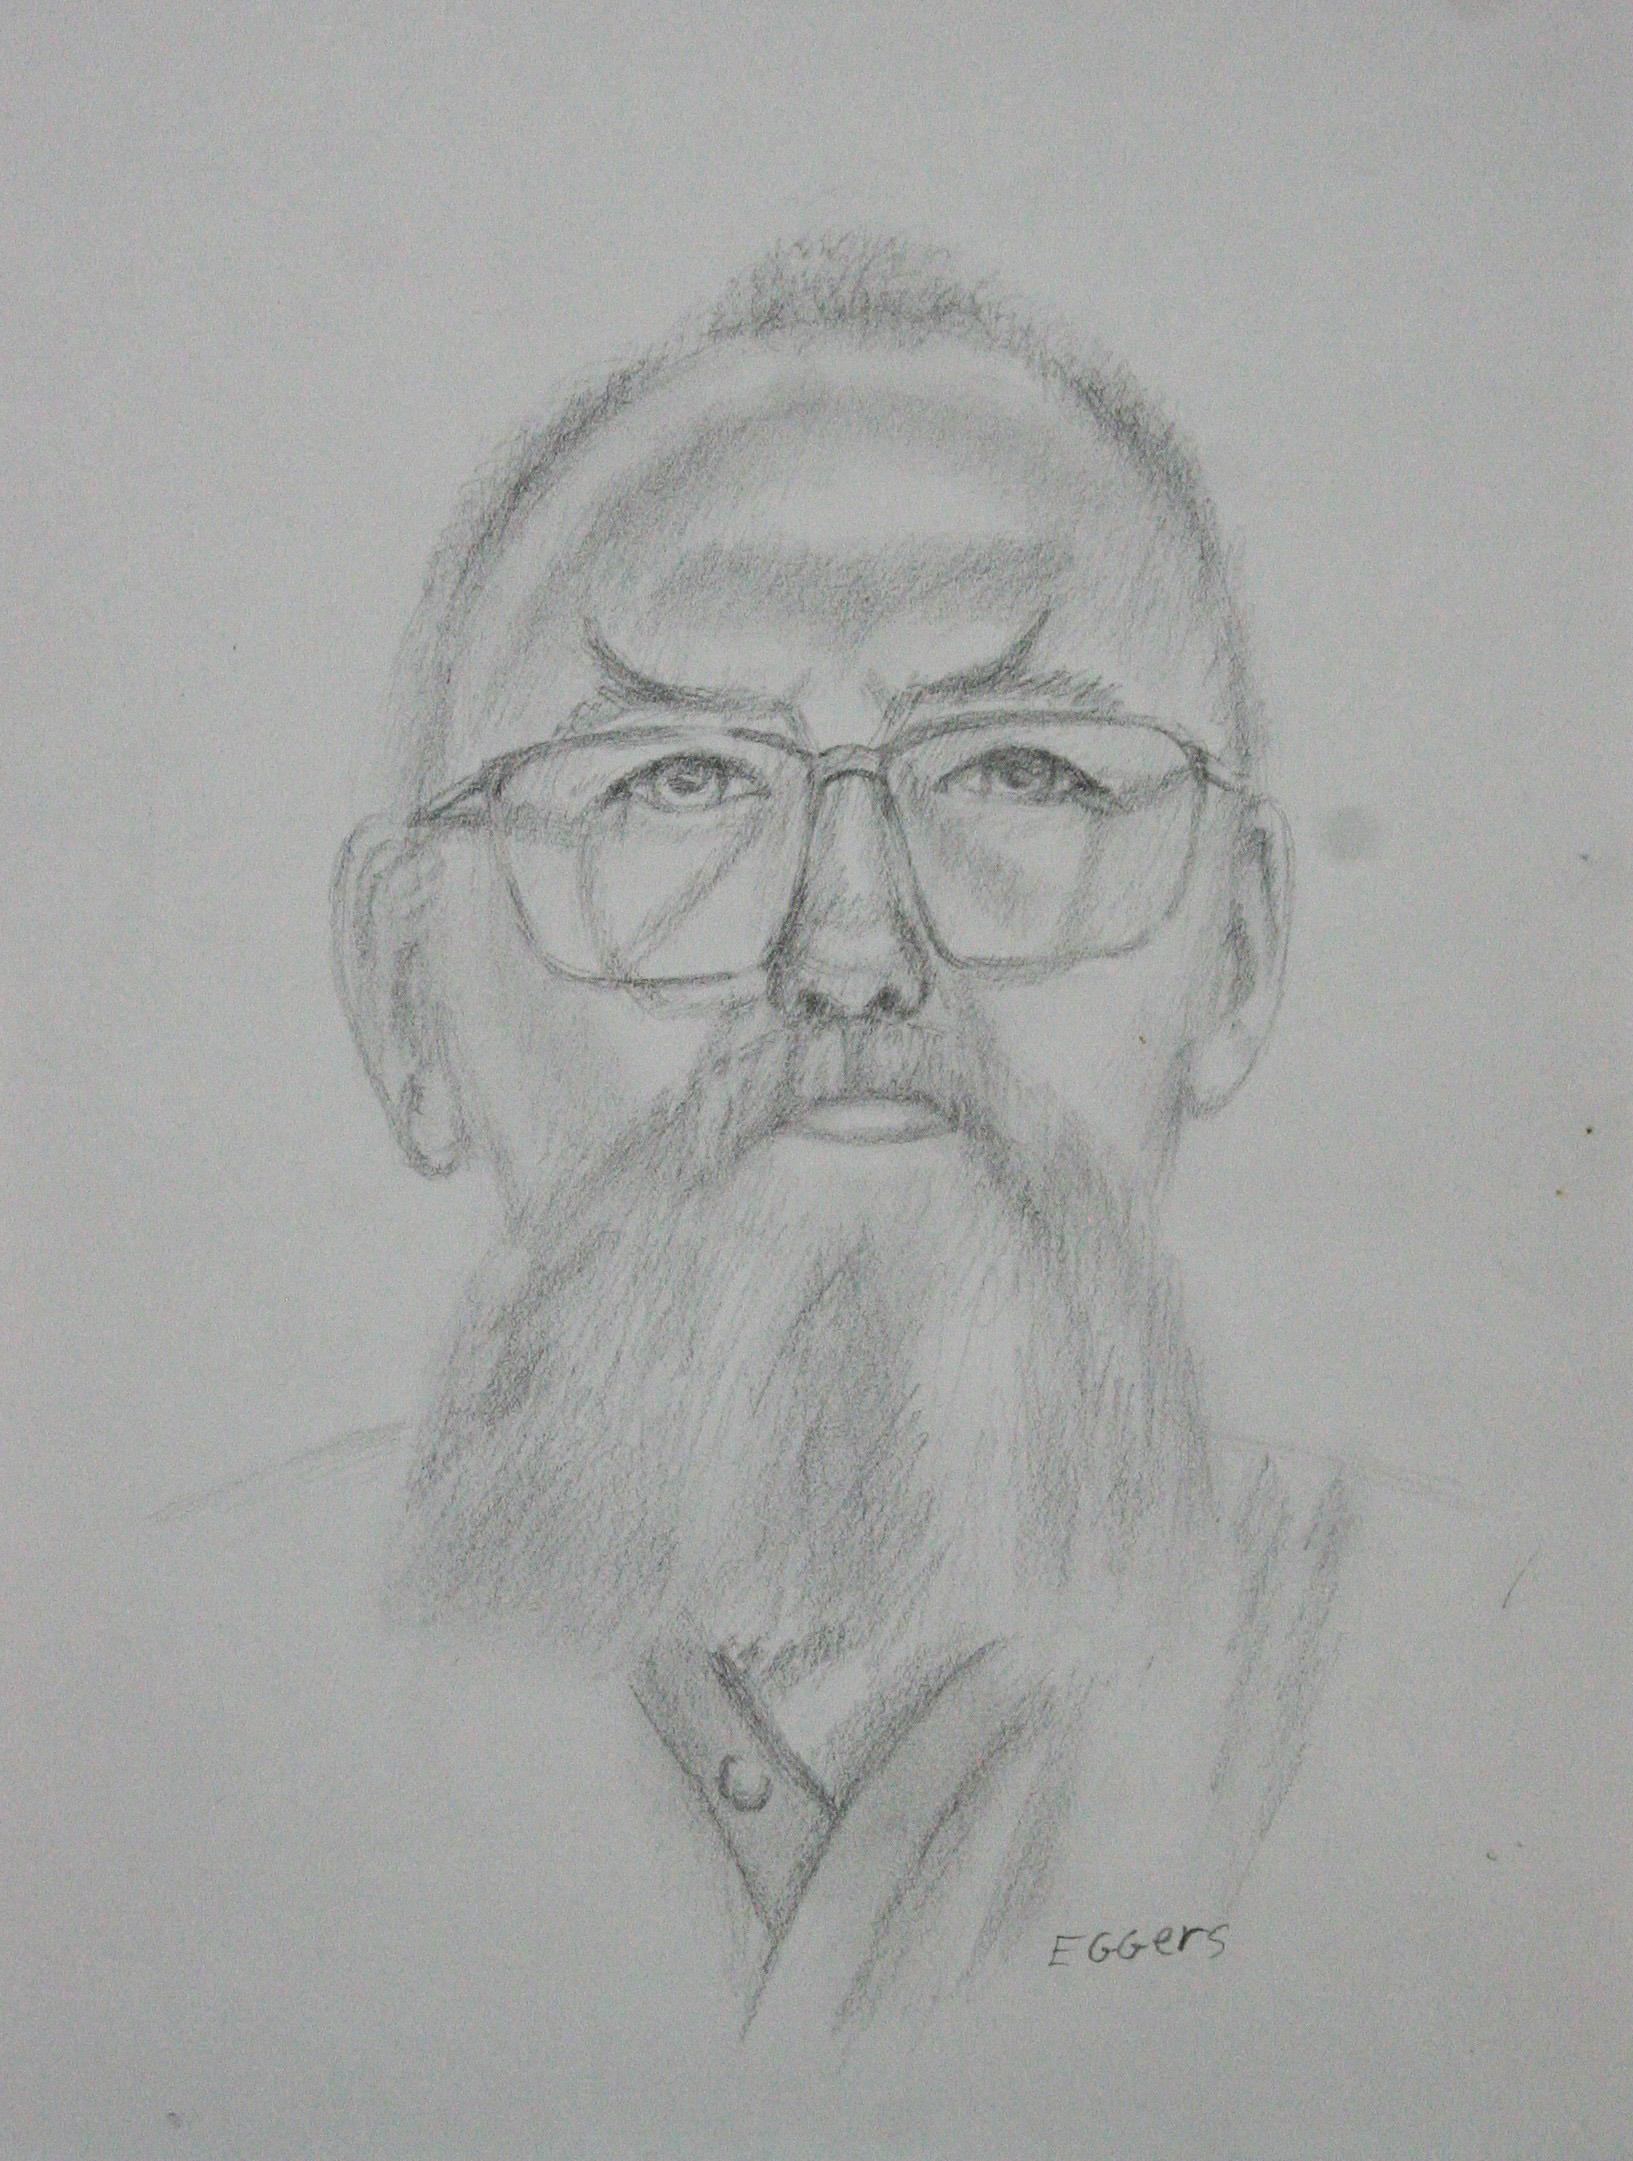 Bob Eggers did this drawing.